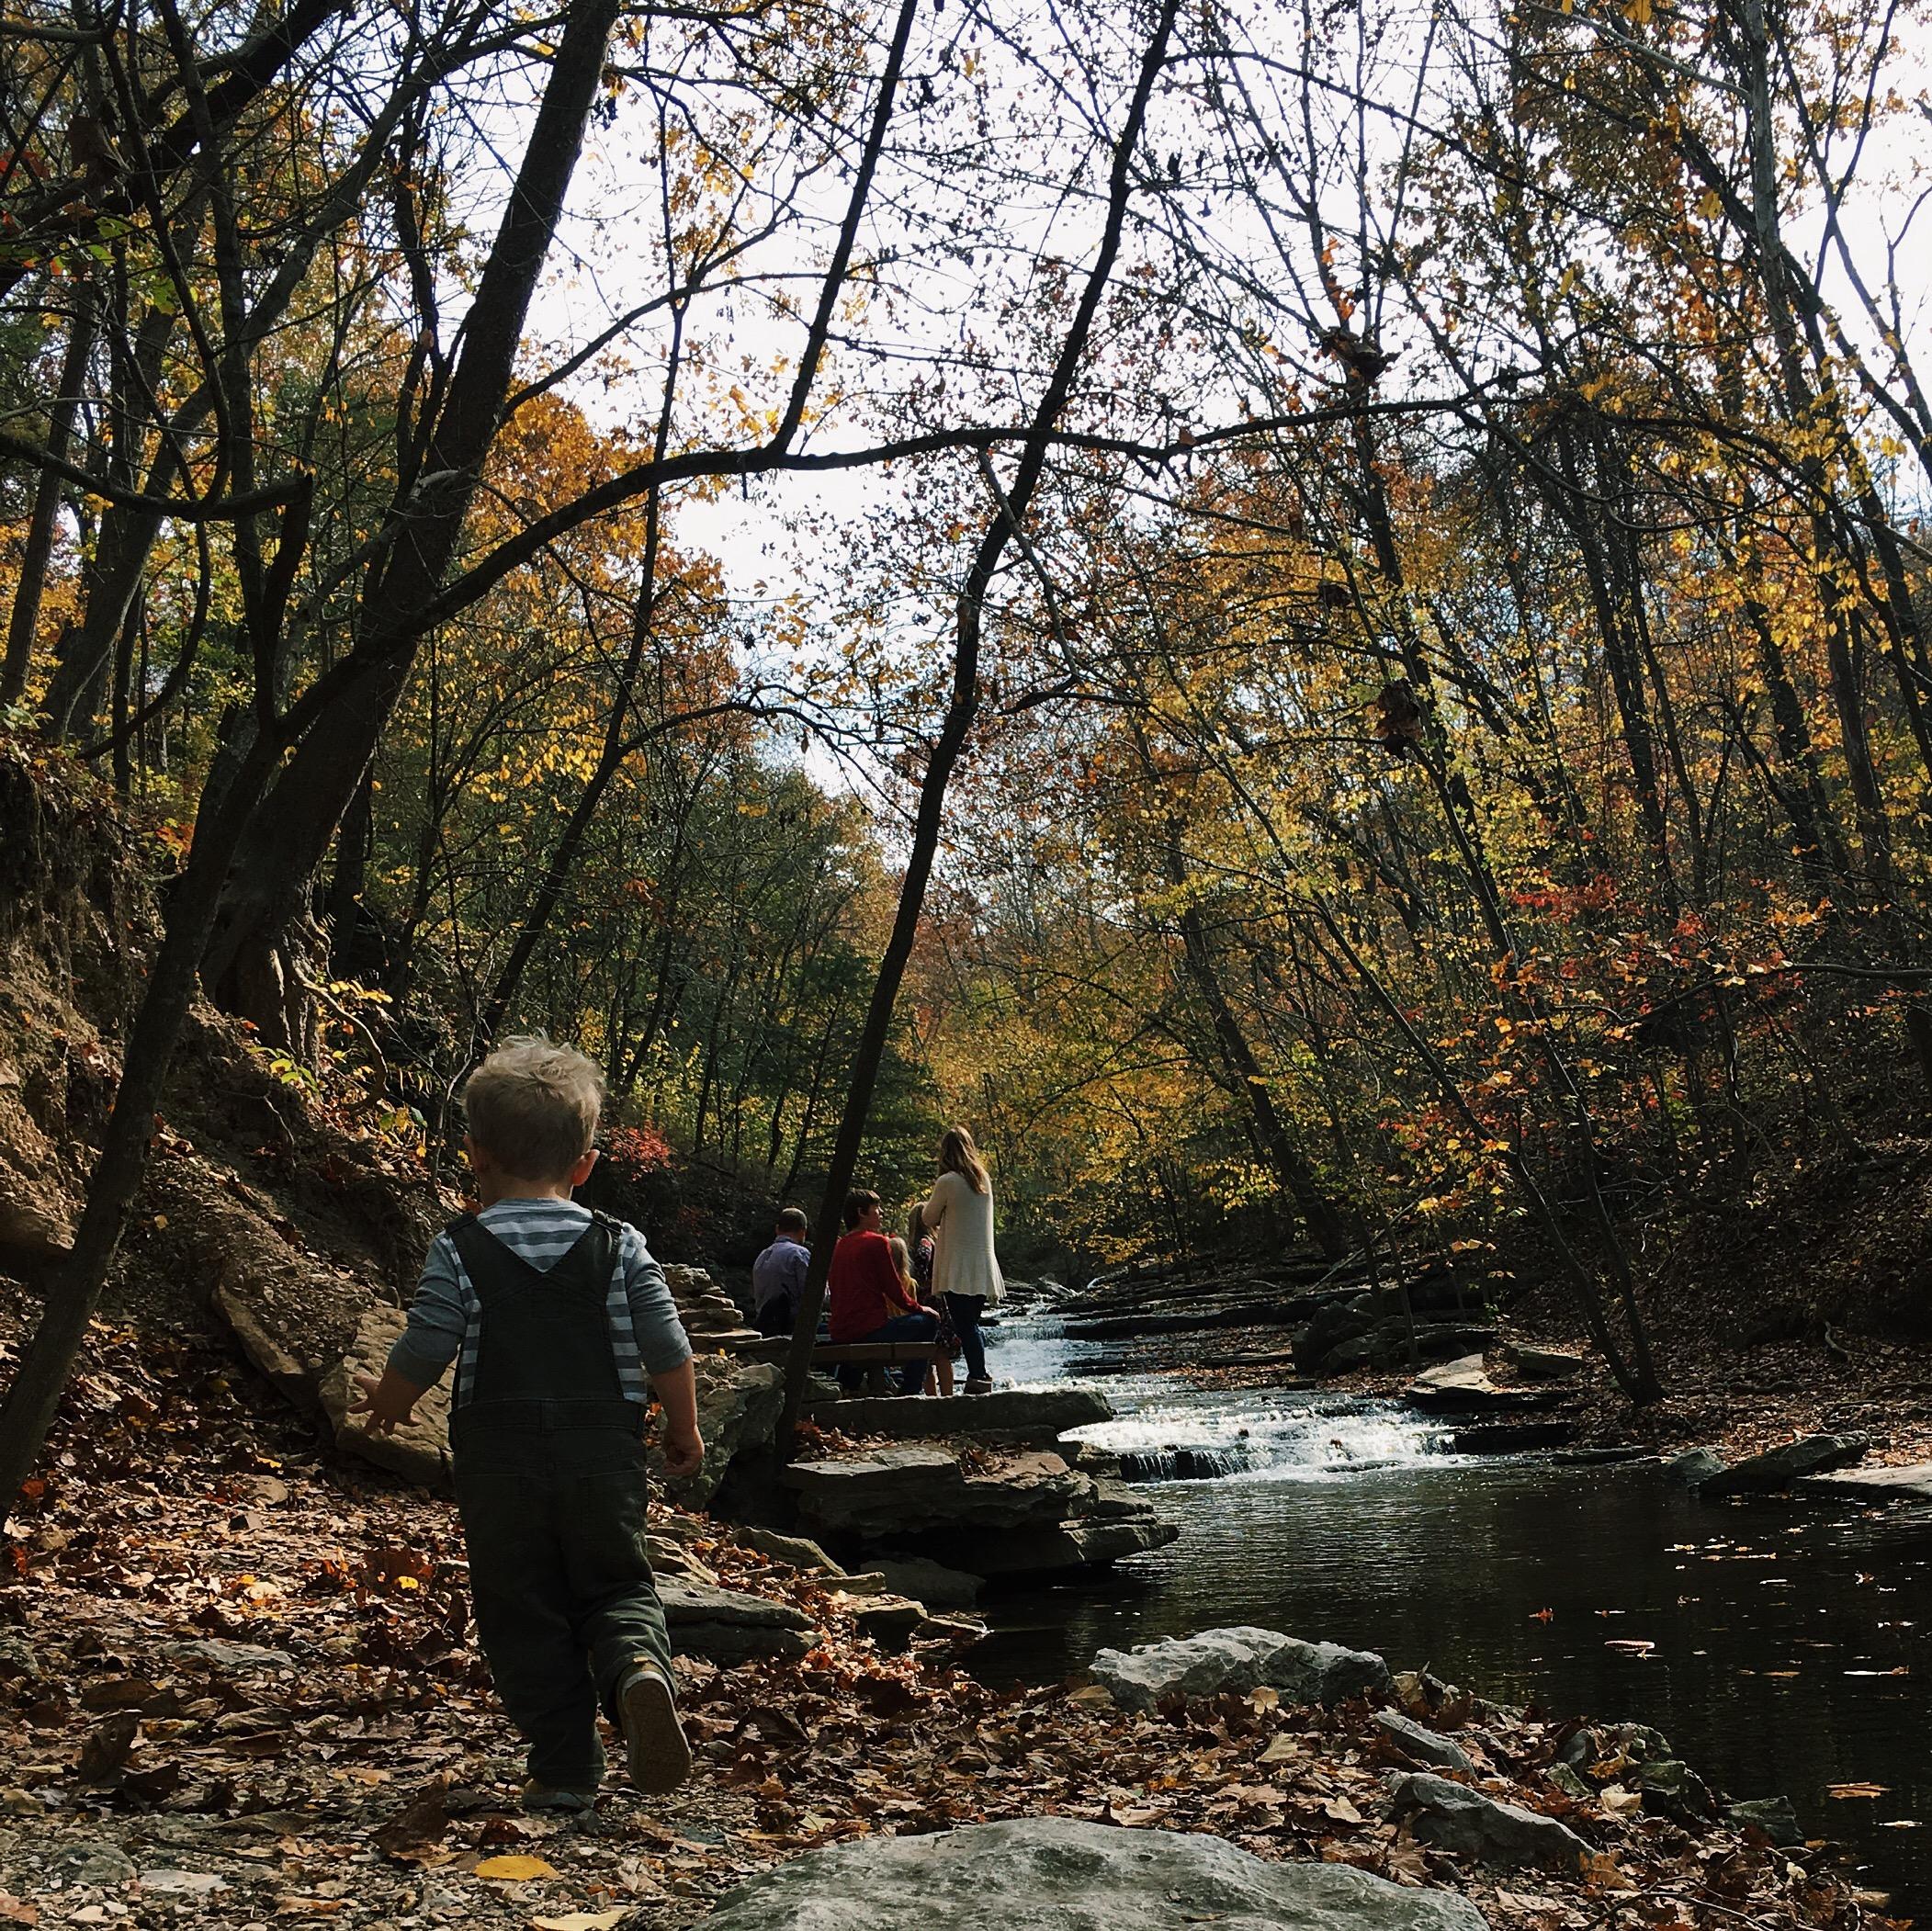 Tanyard creek northwest arkansas hiking trail family friendly